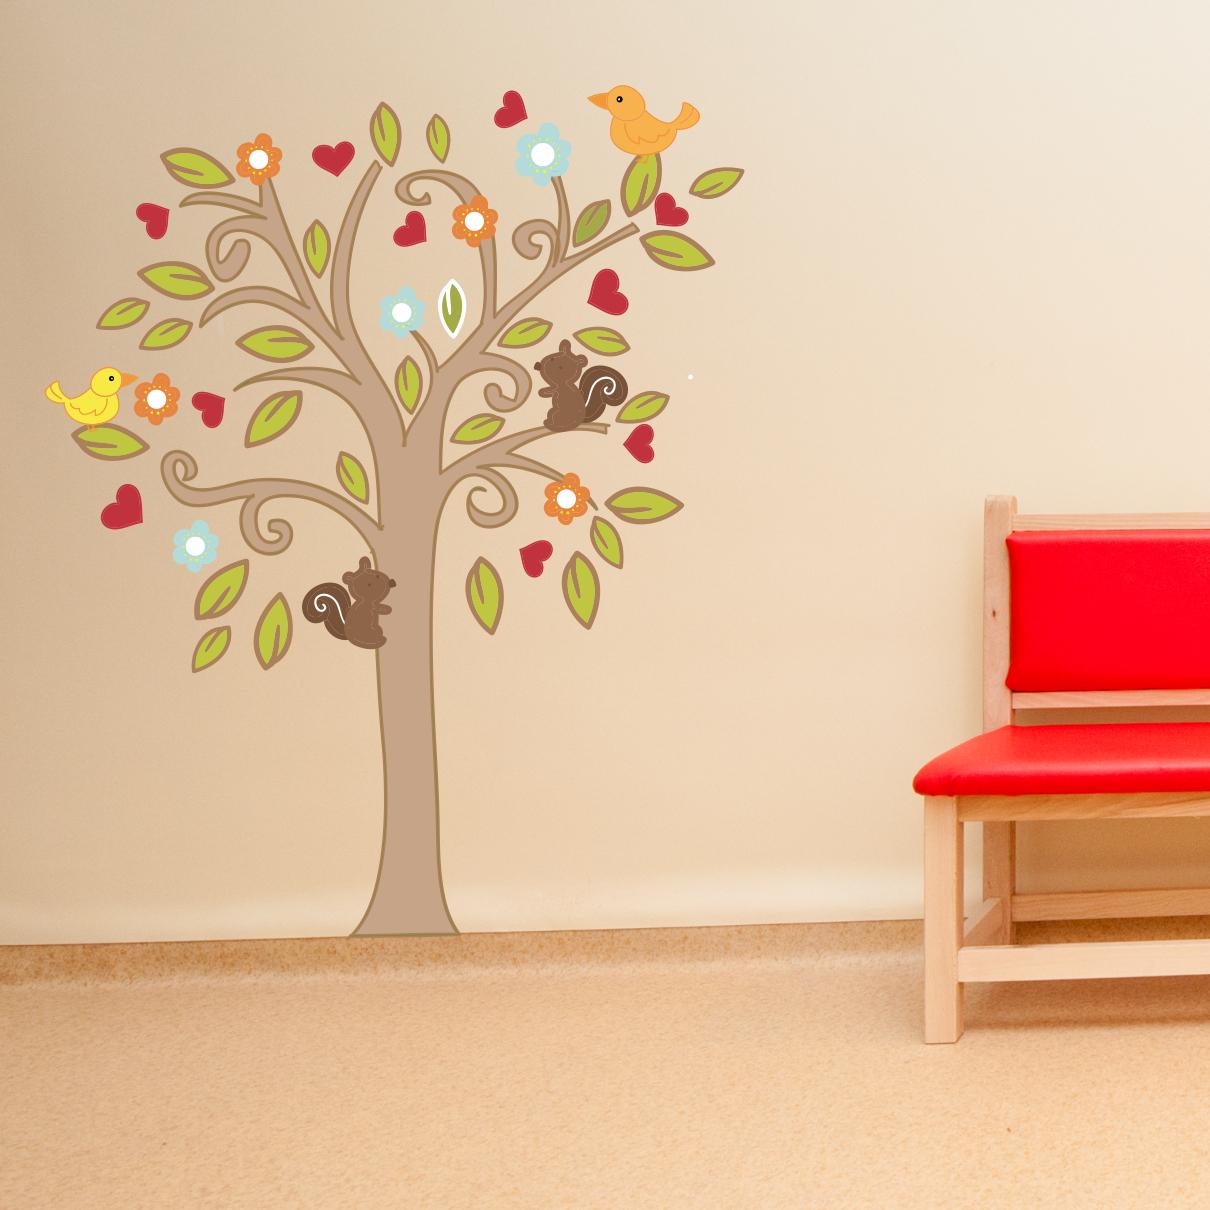 Stickere perete copii Copacel cu animalute - 107 x 130 cm imagine